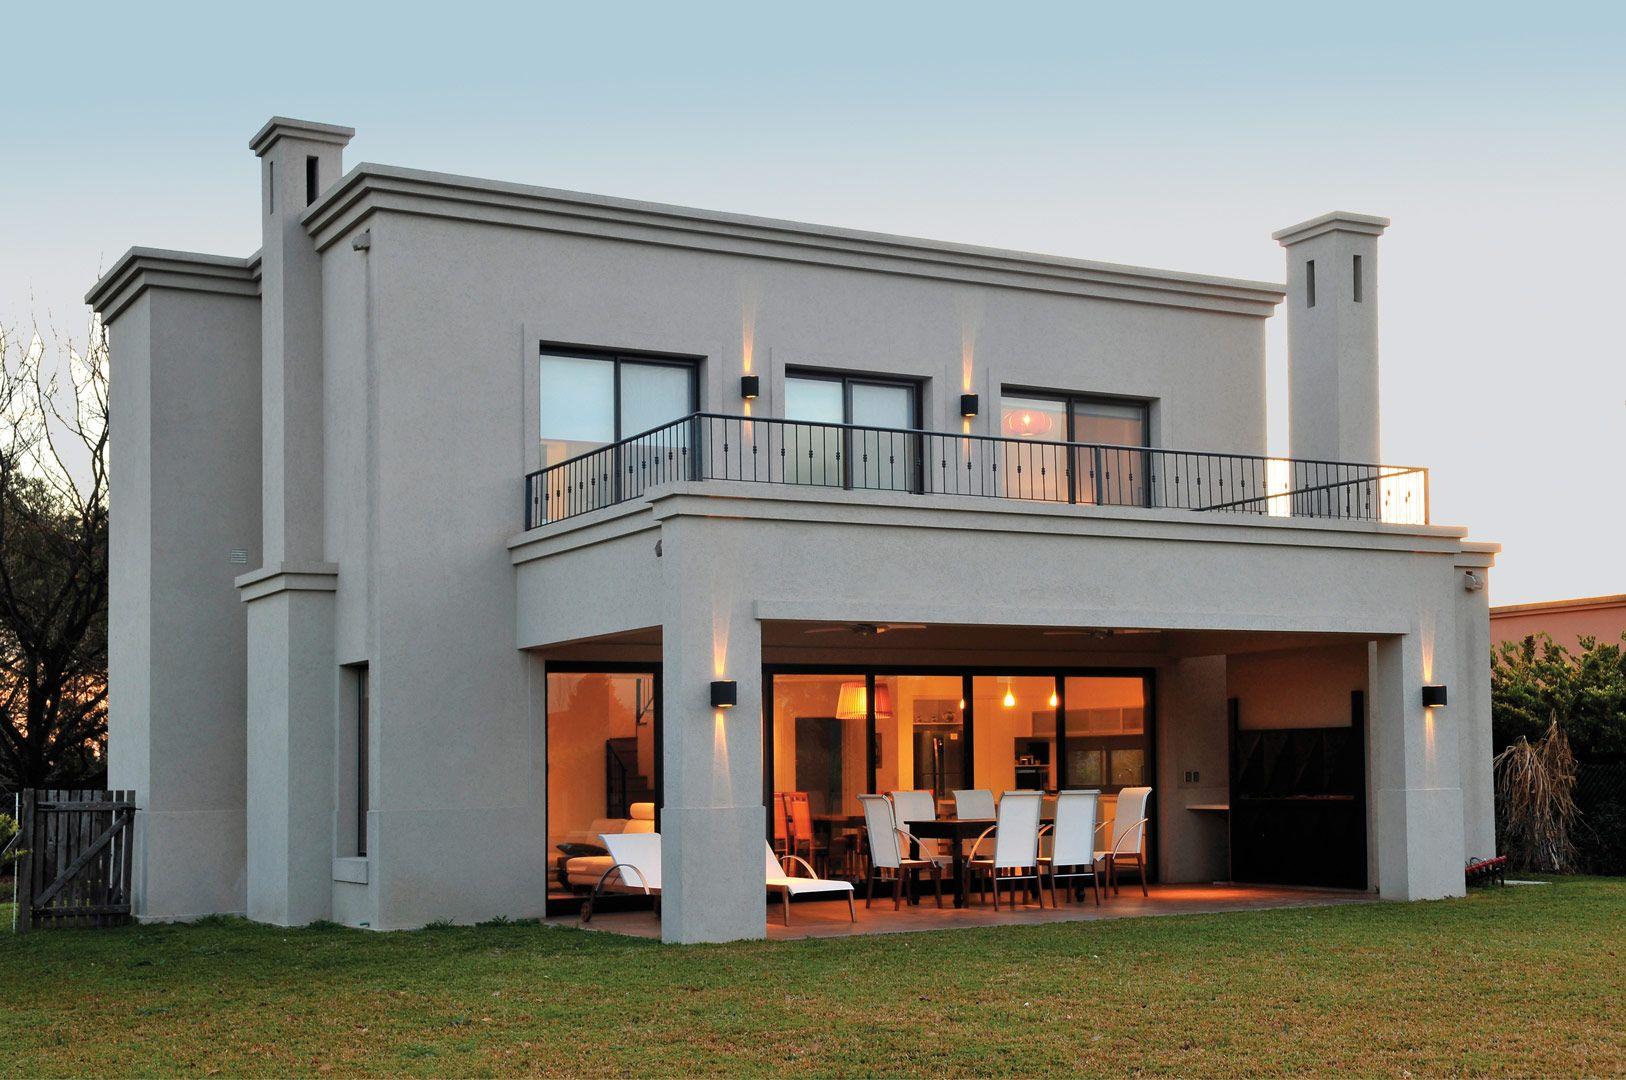 Marcela parrado arquitectura casas e ideas pinterest casas casa estilo y arquitectura - Arquitectos casas modernas ...